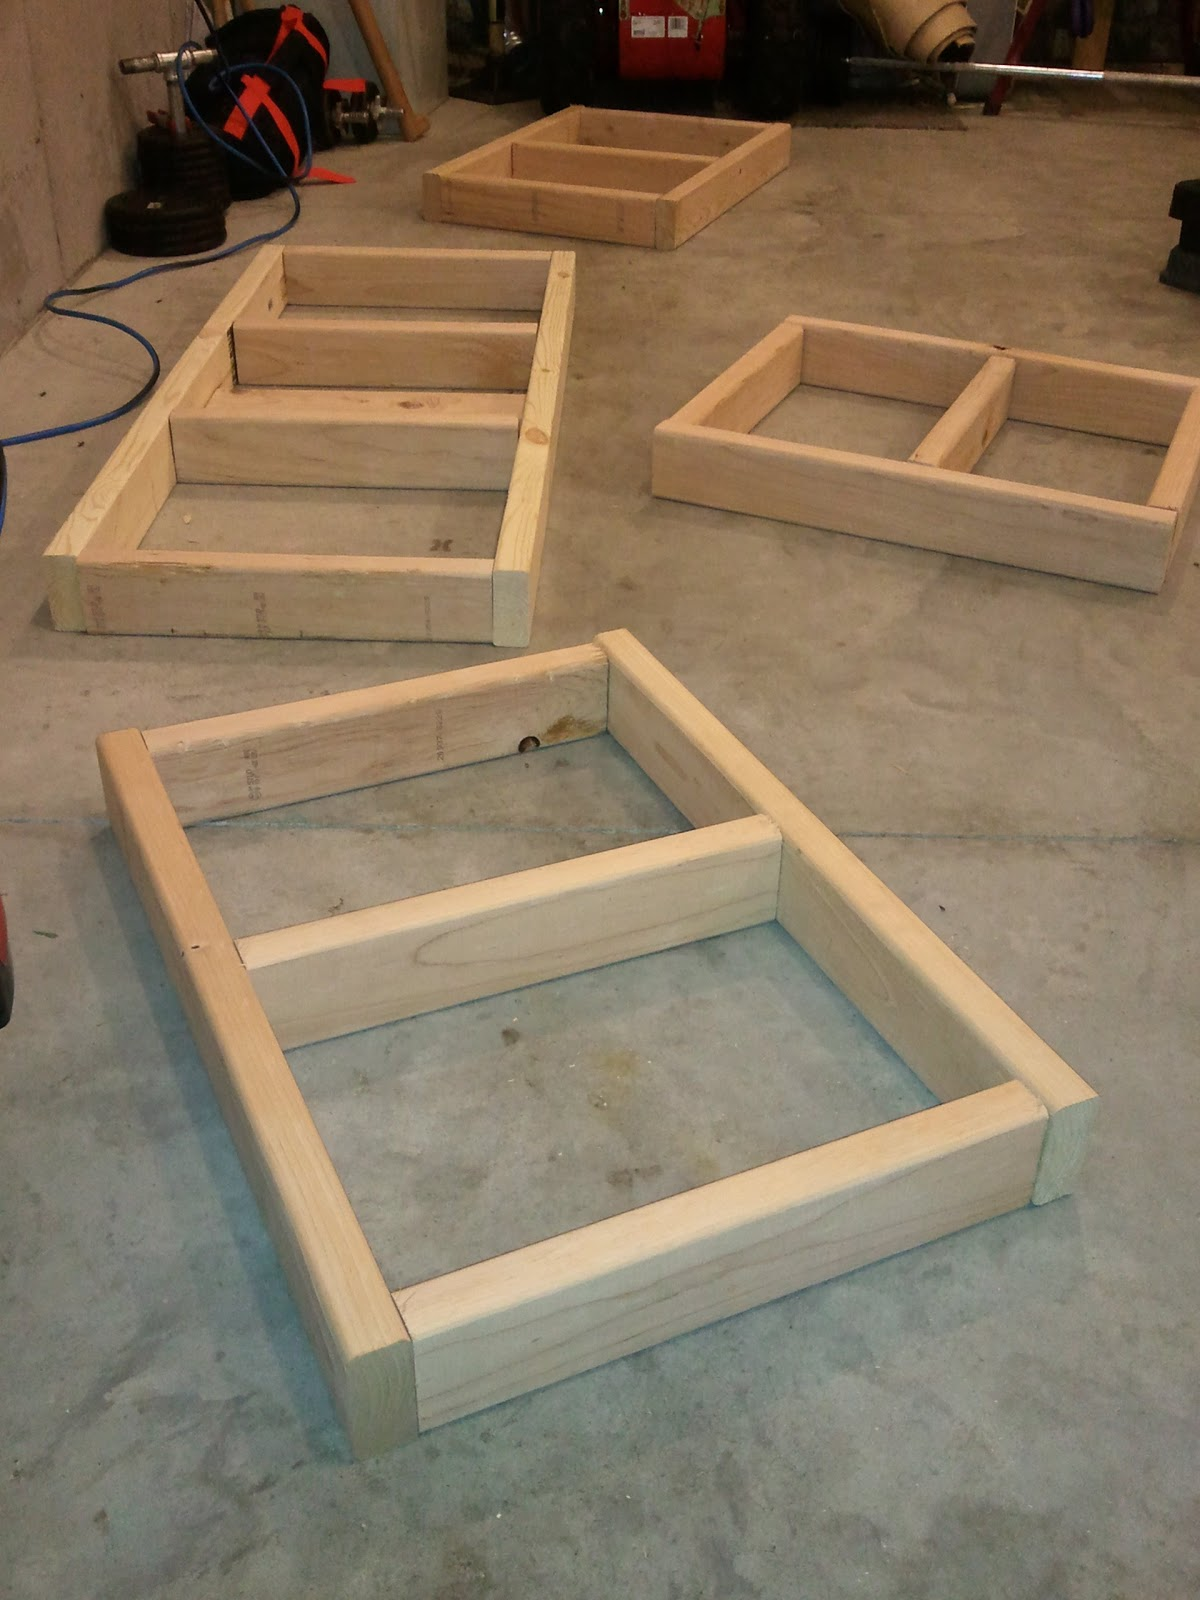 arrange boards into frame on flat surface